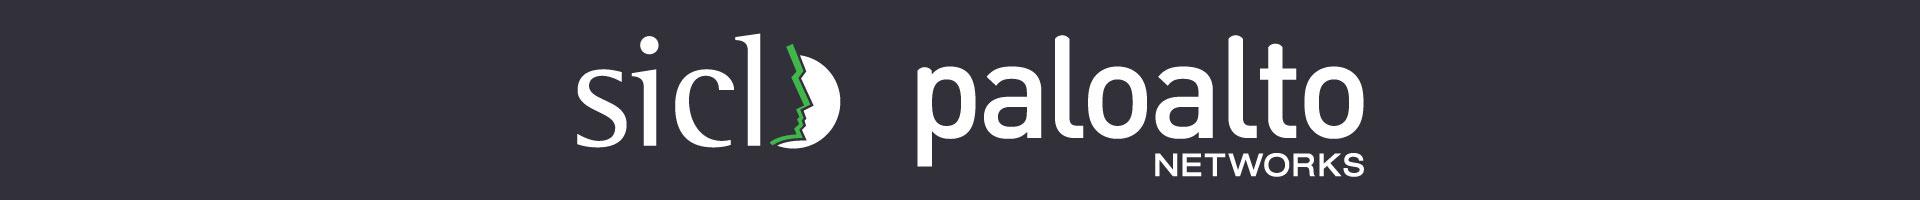 logo-banner_grey.jpg